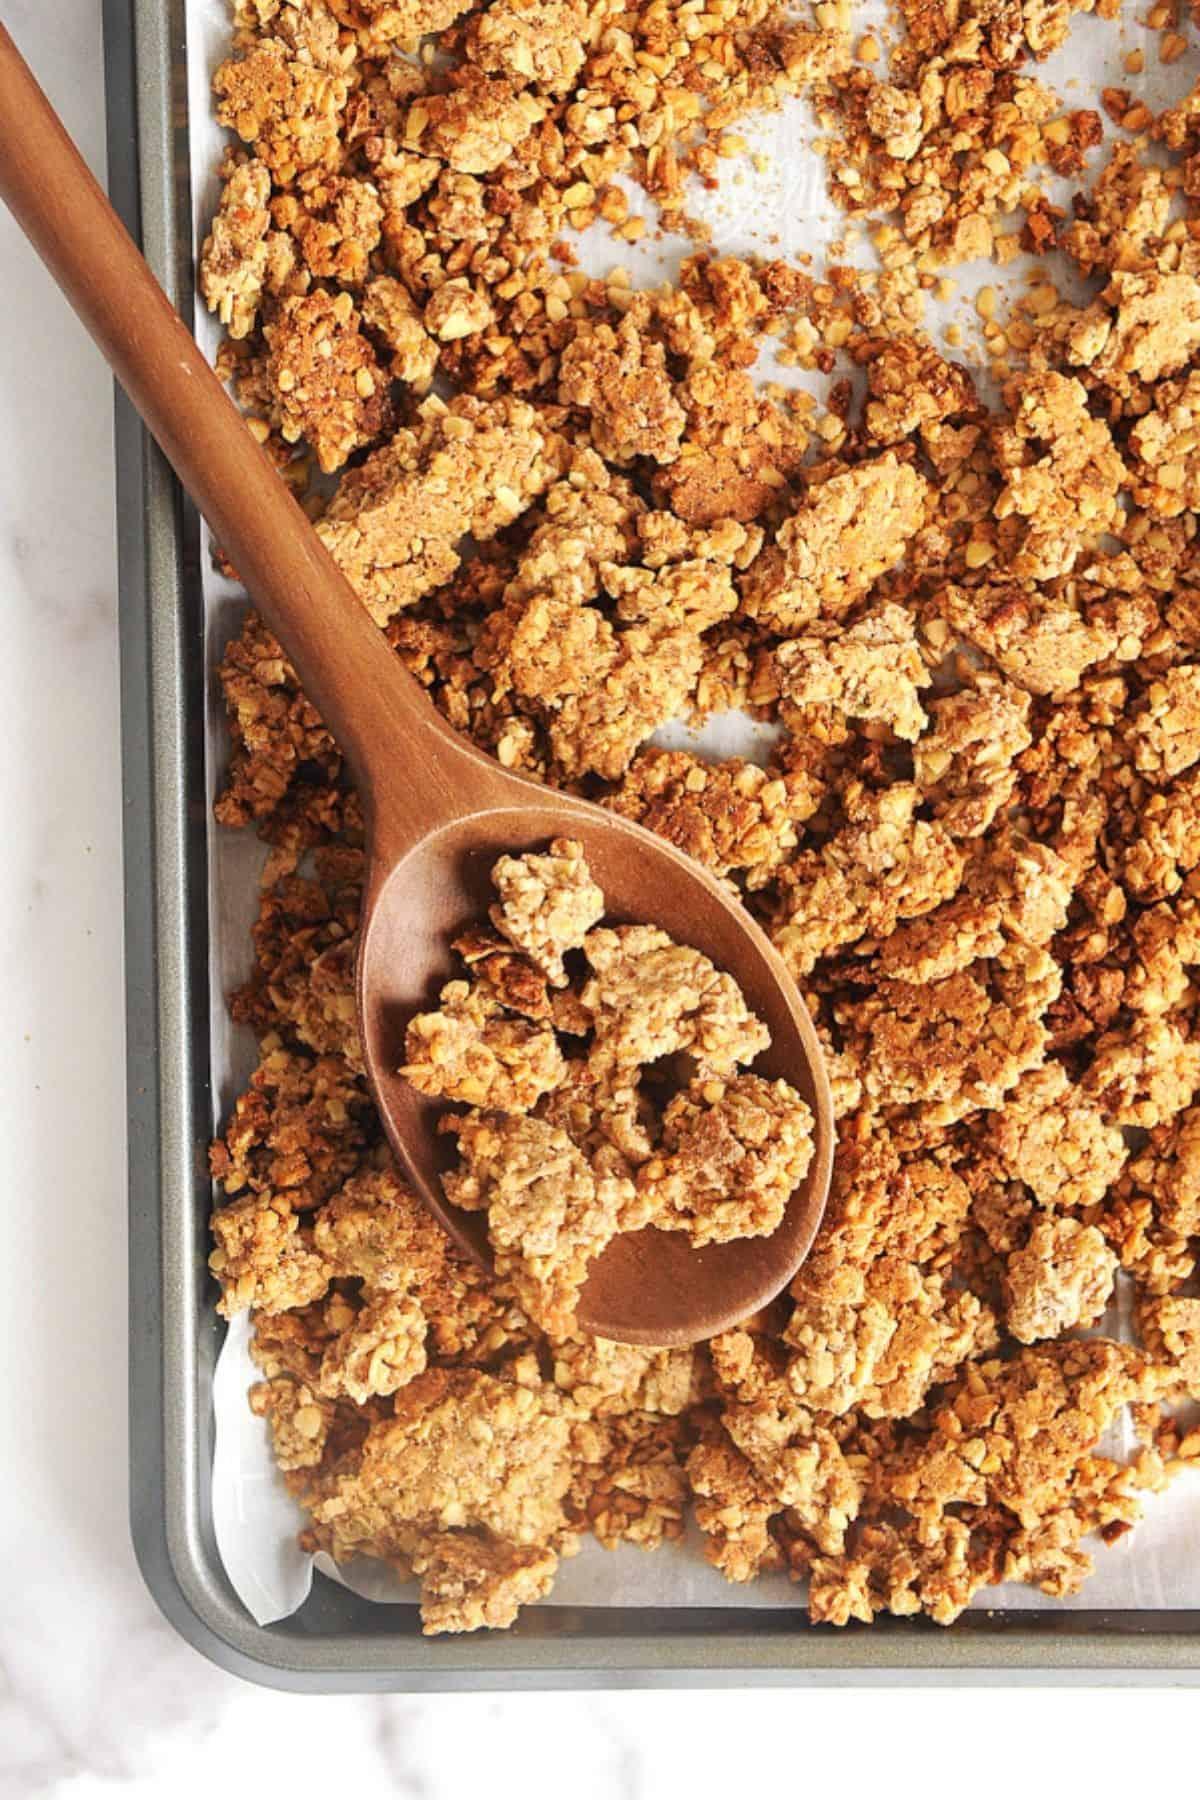 gluten free granola on a sheet pan